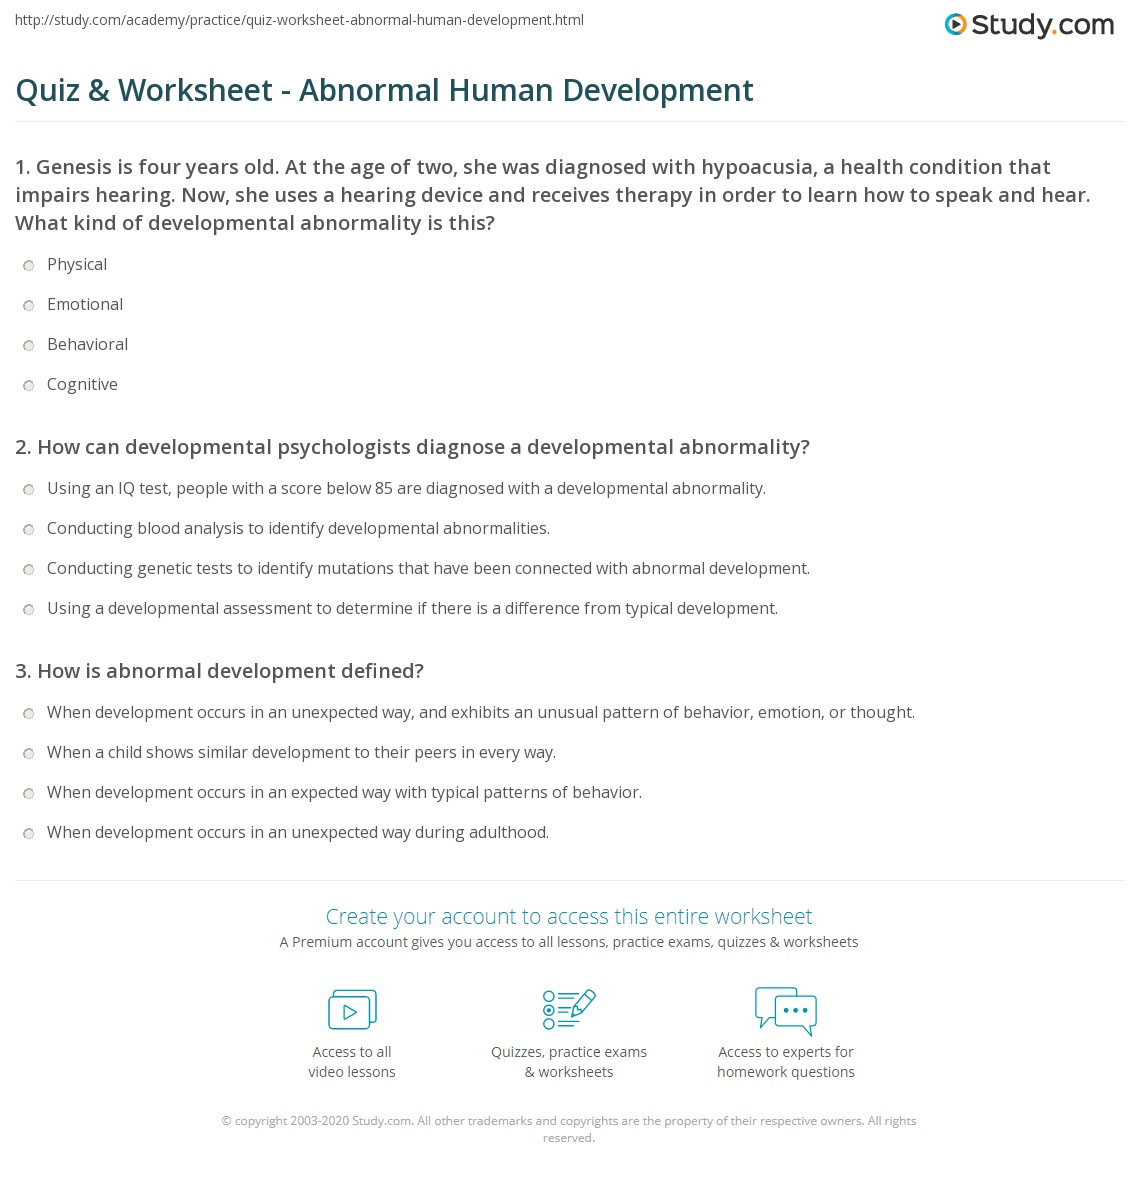 Quiz & Worksheet - Abnormal Human Development | Study.com